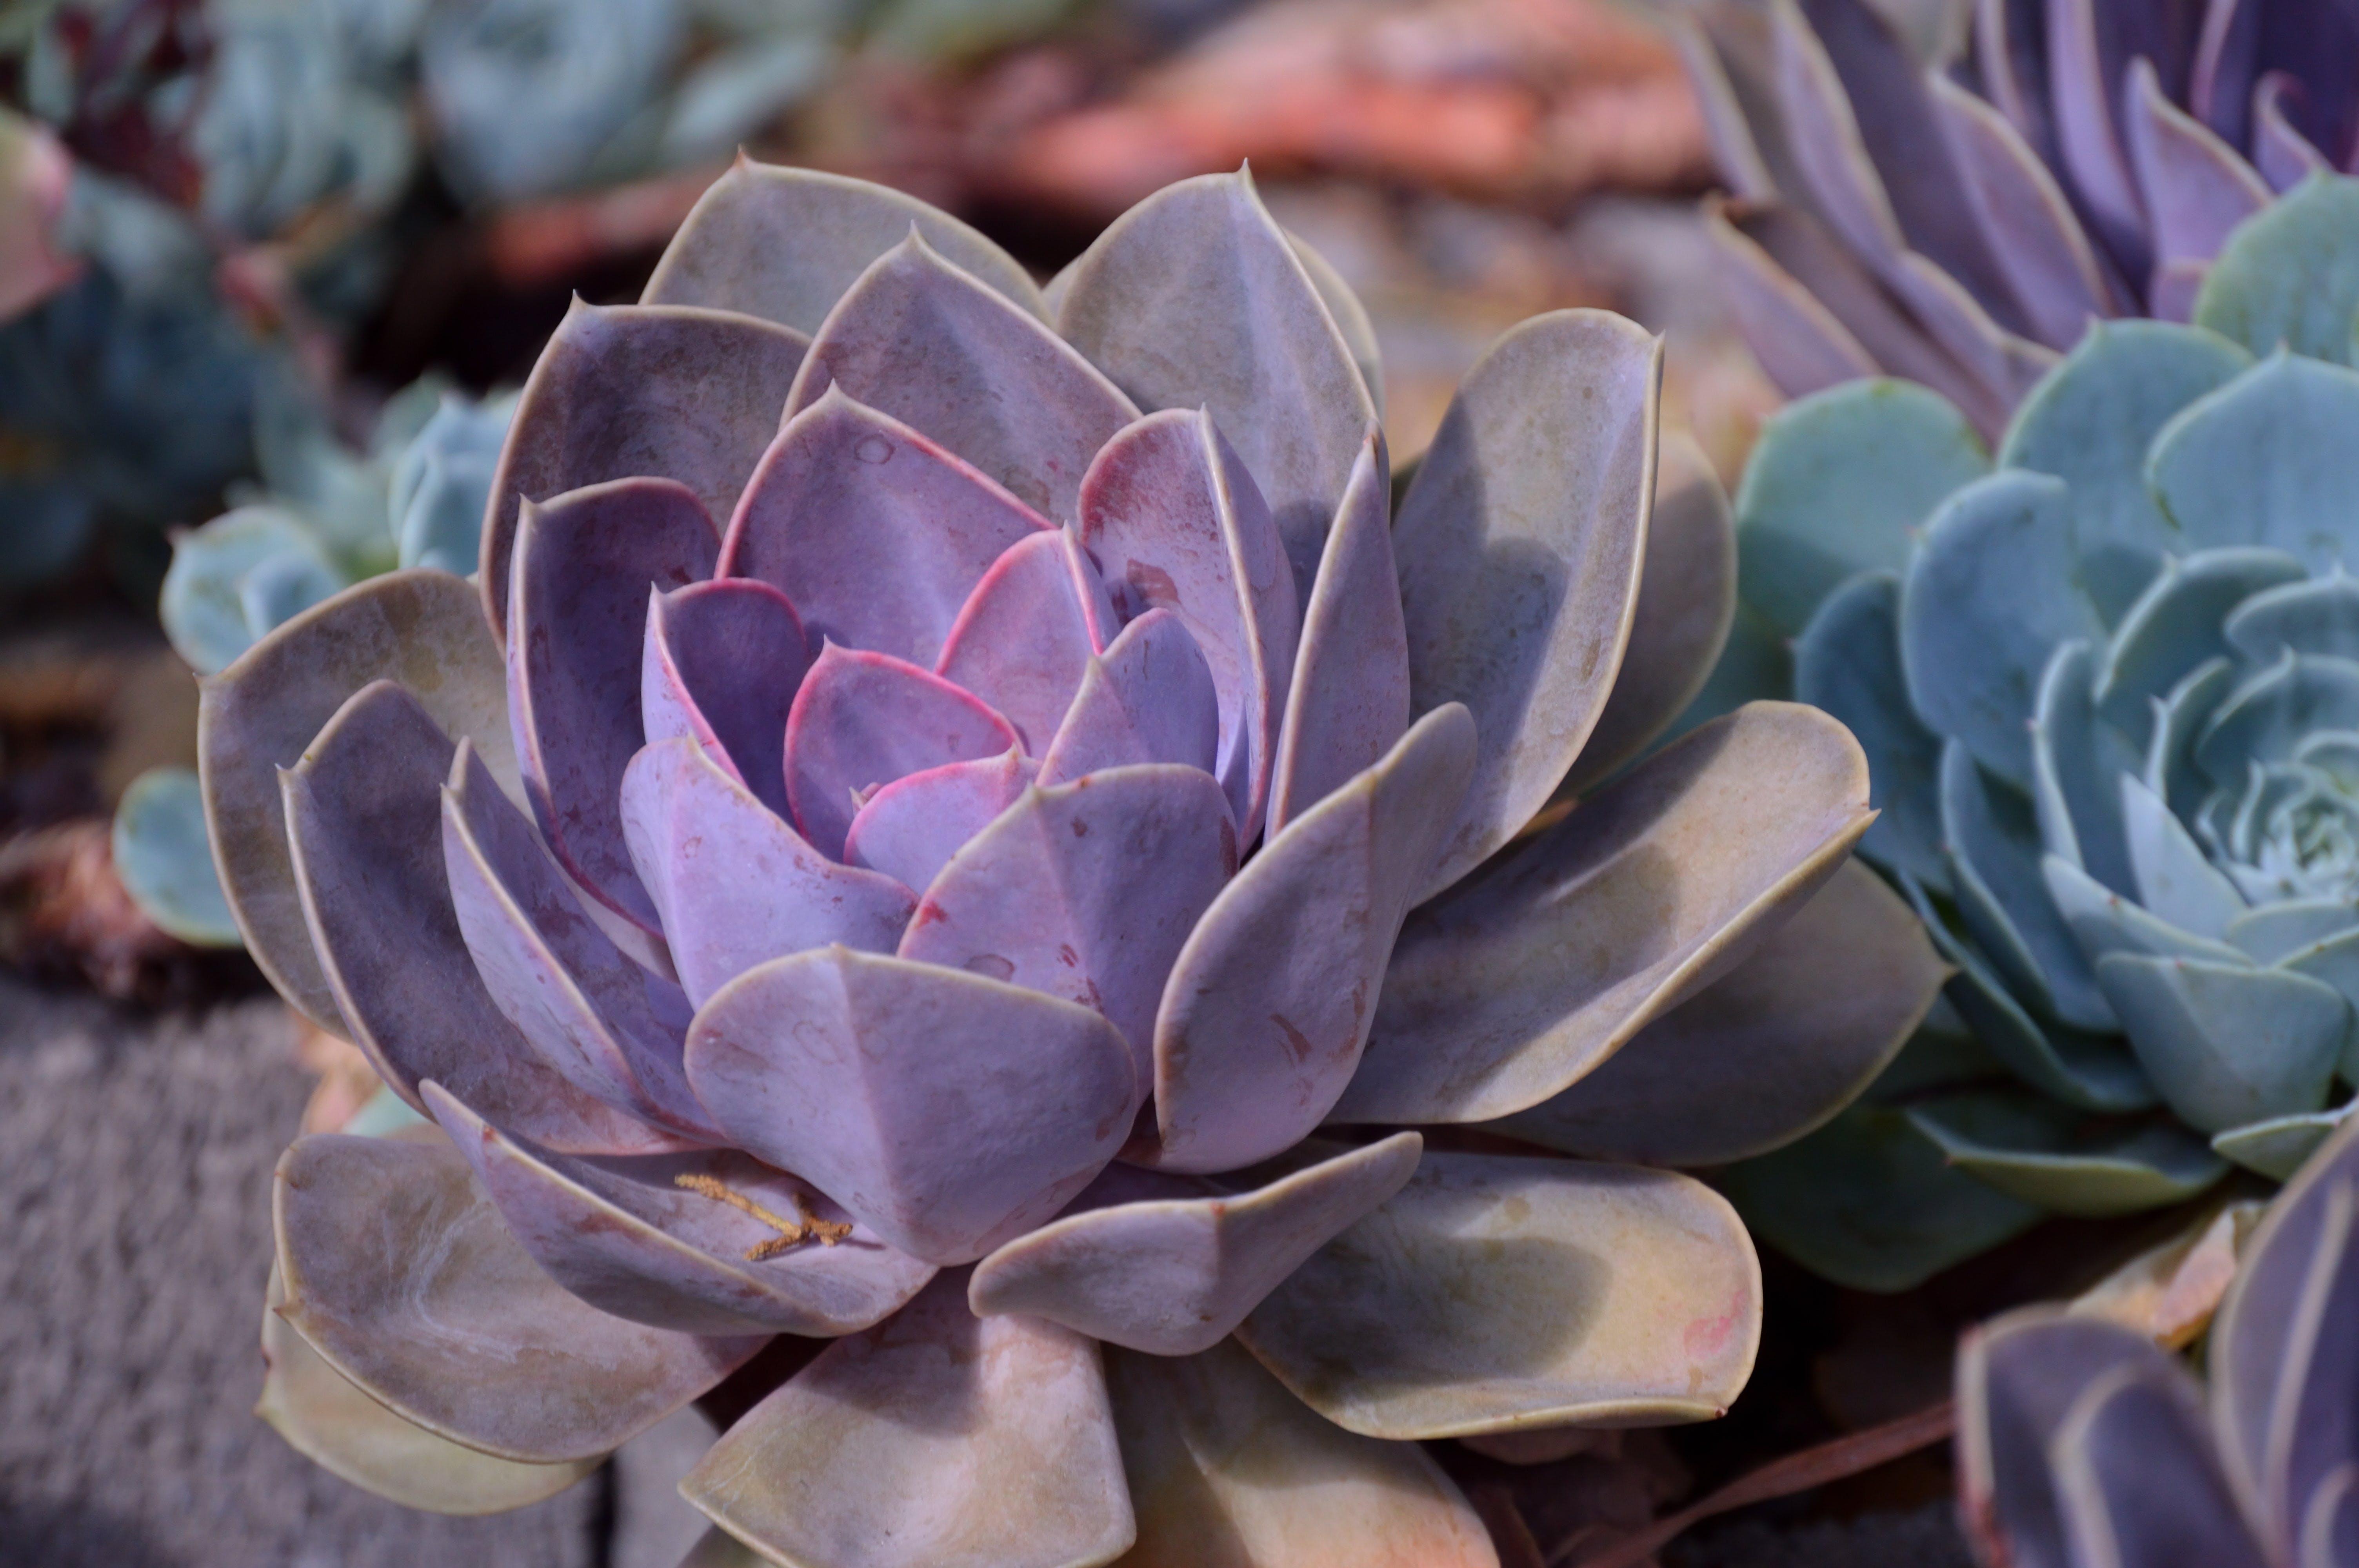 Kostenloses Stock Foto zu blatt, blumen, botanik, botanisch